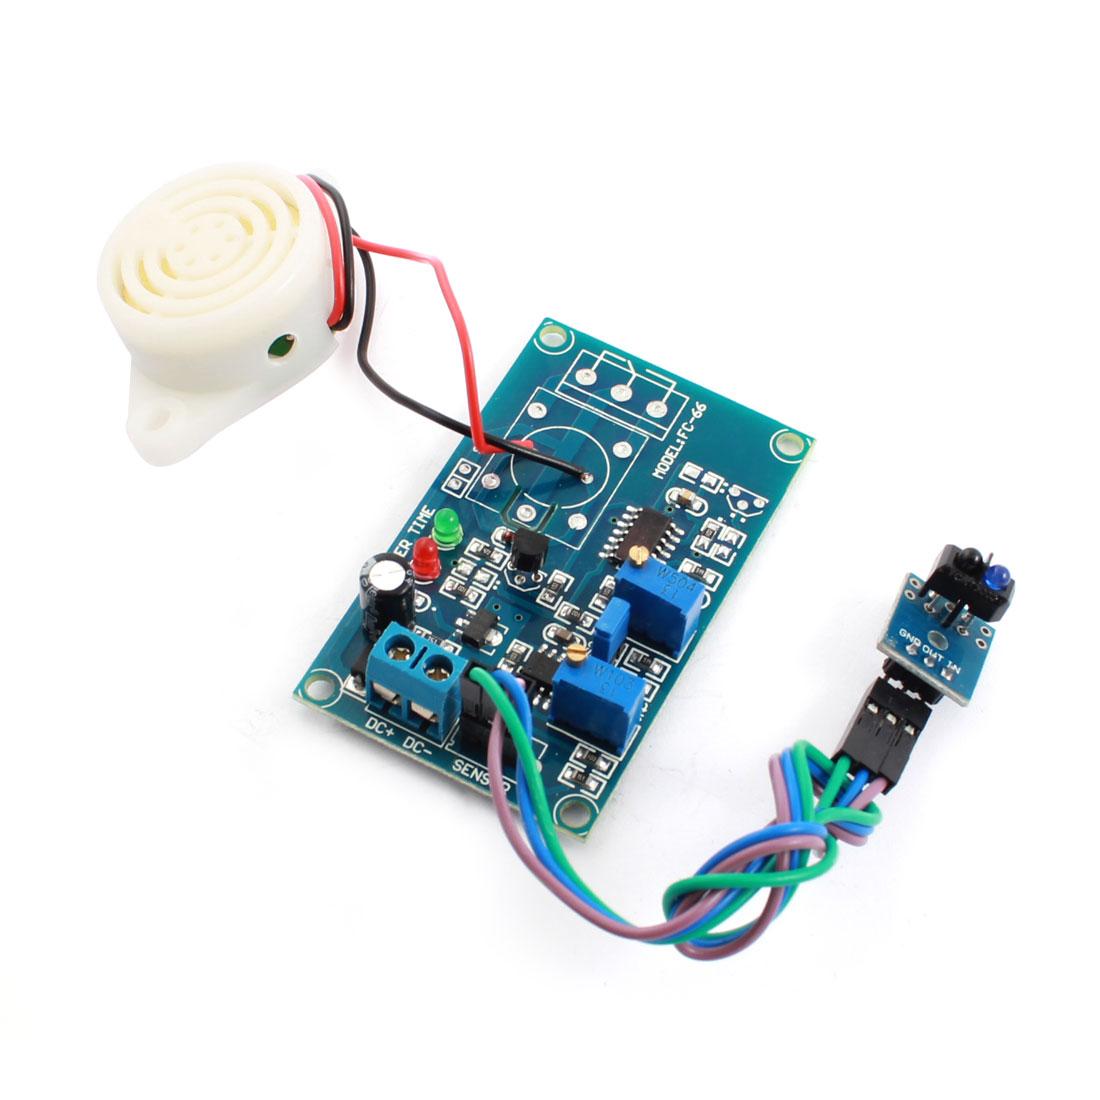 FC-66 TCRT5000 DC24V 0-20S 0-3cm Infrared Reflection Light Detection Sensor Alarm Buzzer Time Delay Module Blue